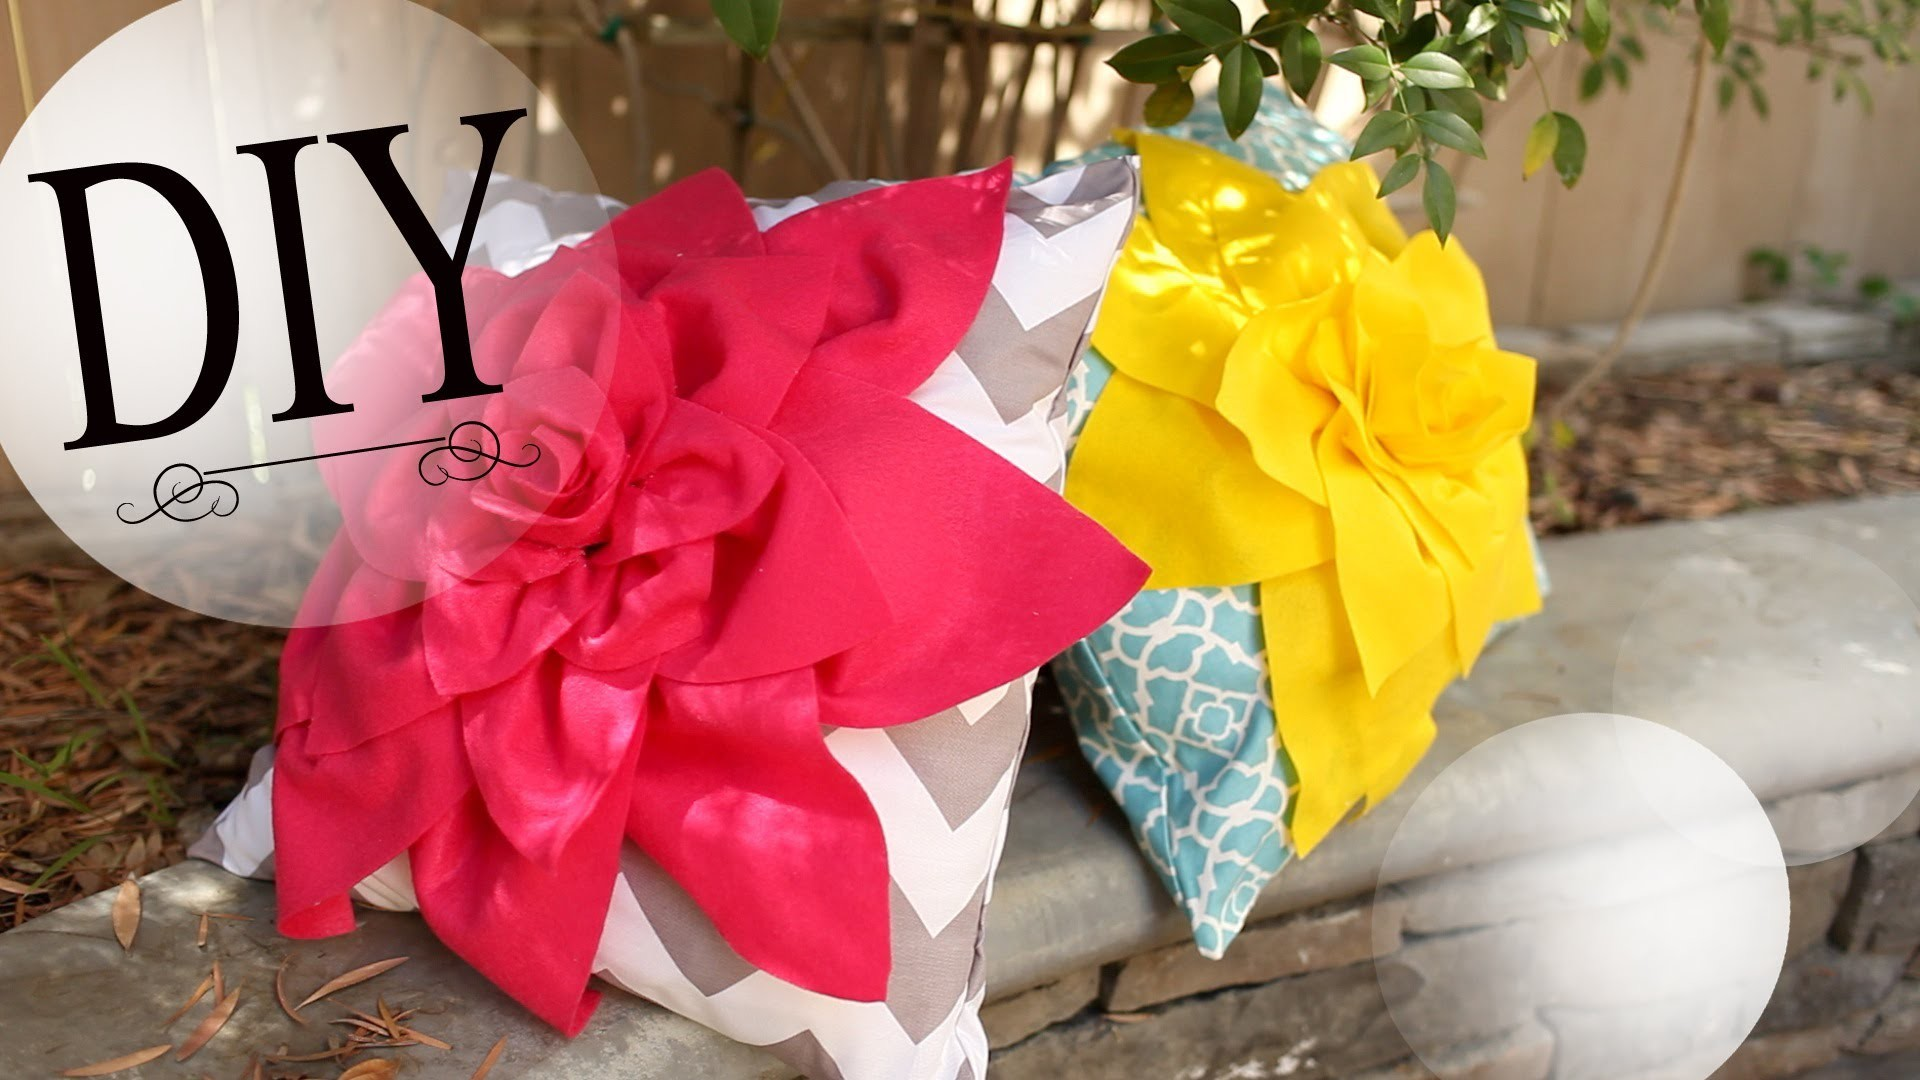 DIY Room Decor: How to Make a Cute Flower Pillow